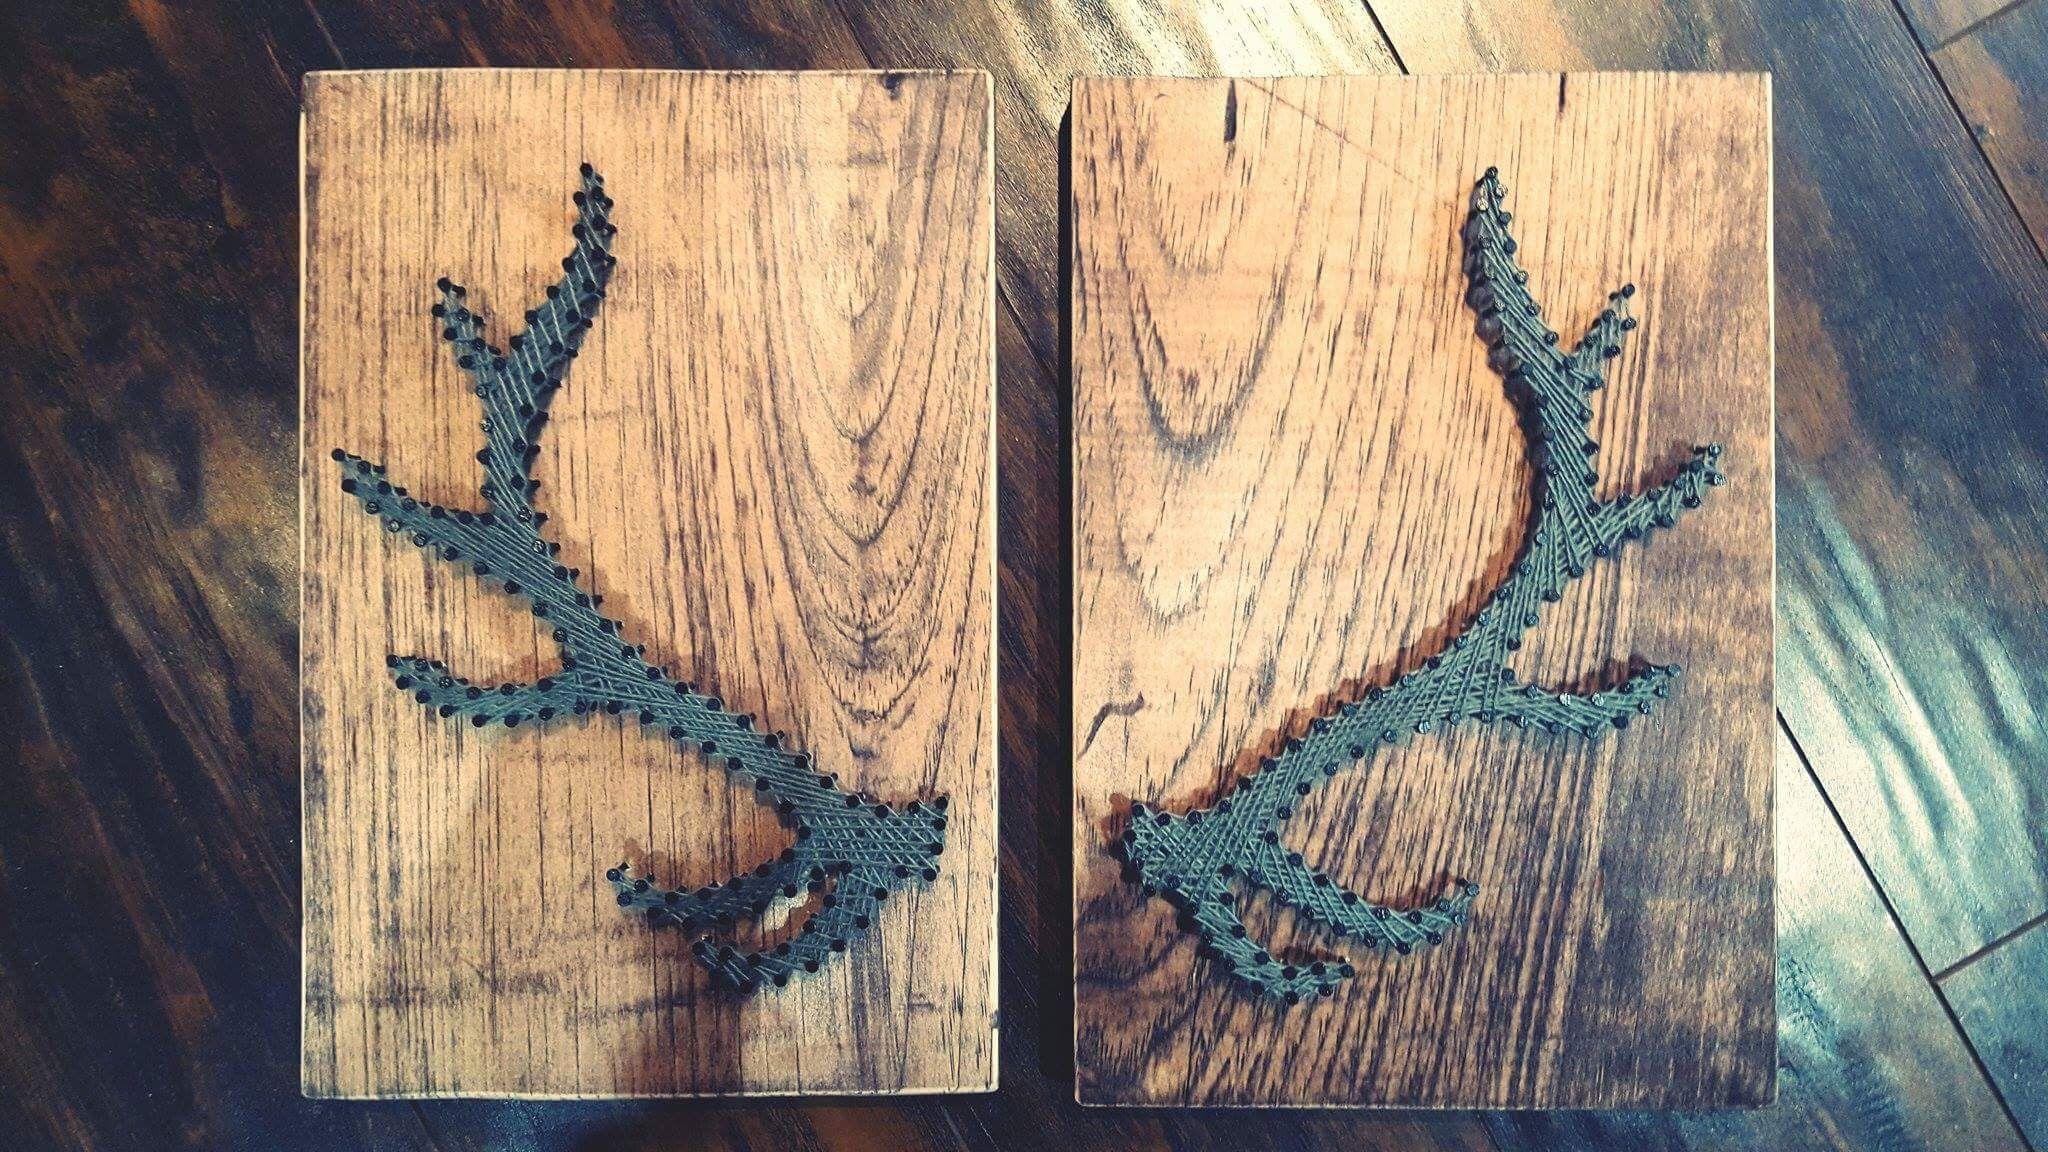 String Art- nails, stained wood, antlers, elk, handmade, yarn, wall art Made By: Jennifer MacLeod Schutt